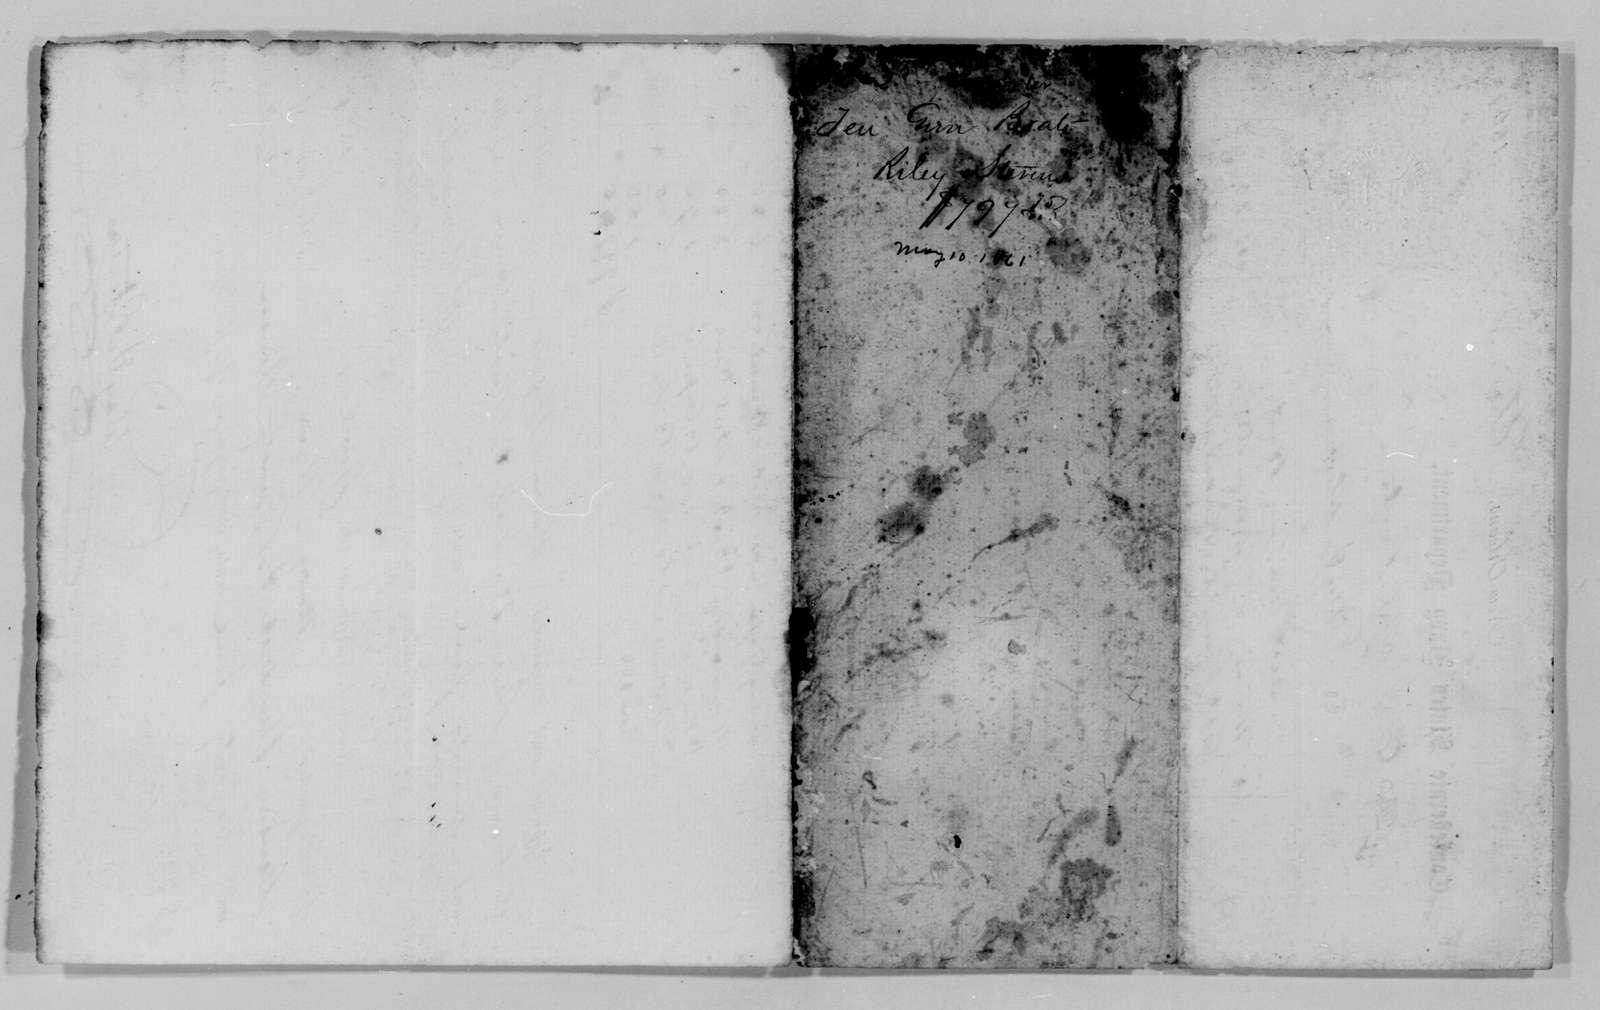 Confederate States of America records: Microfilm Reel 69